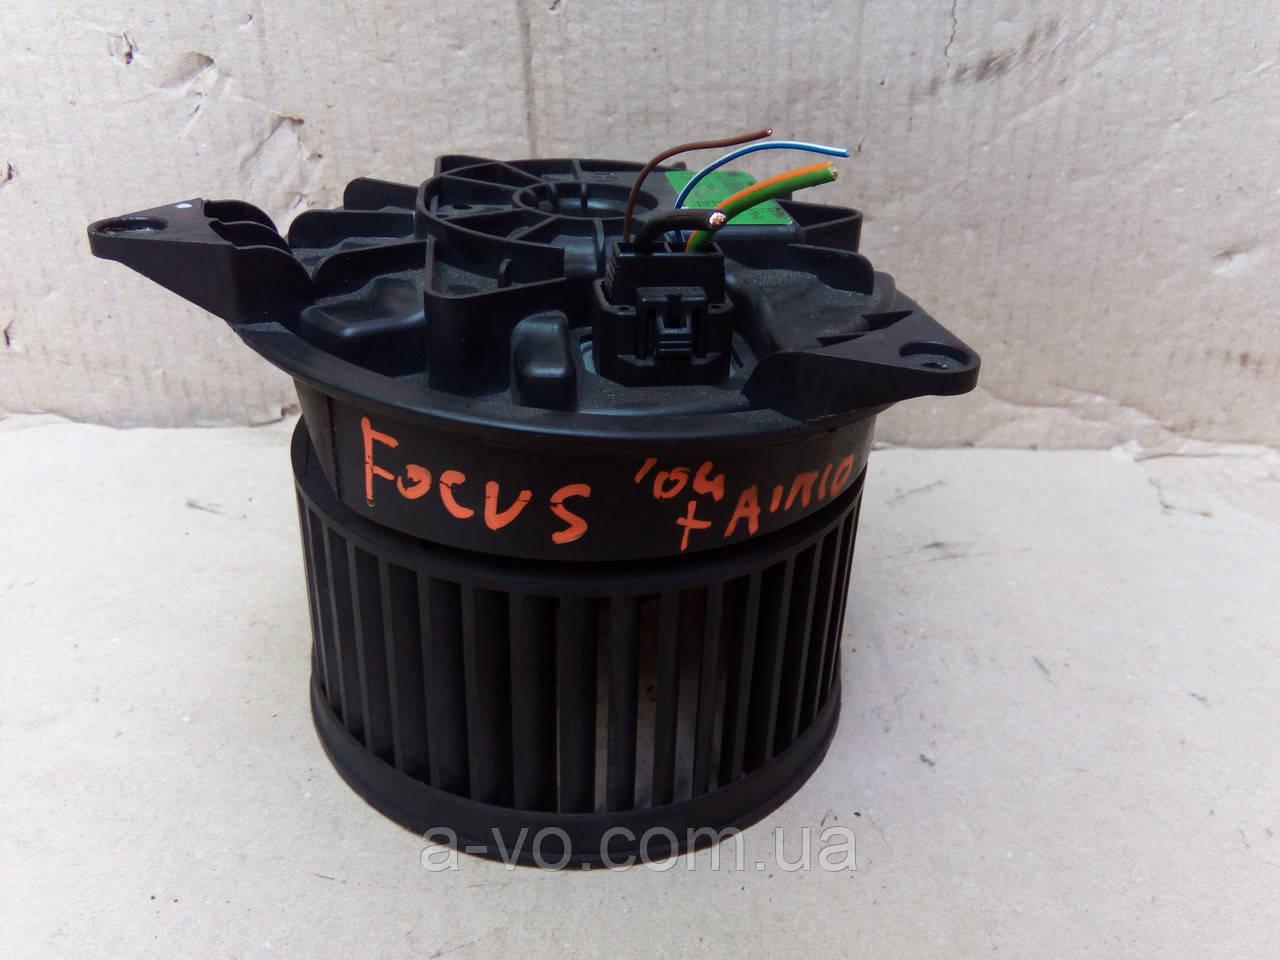 Вентилятор моторчик печки Ford Focus 1 Mondeo 3, 1S7H-18456-AD, 1S7H-18456-AC, 1S7H18456AD, 1S7H18456AC